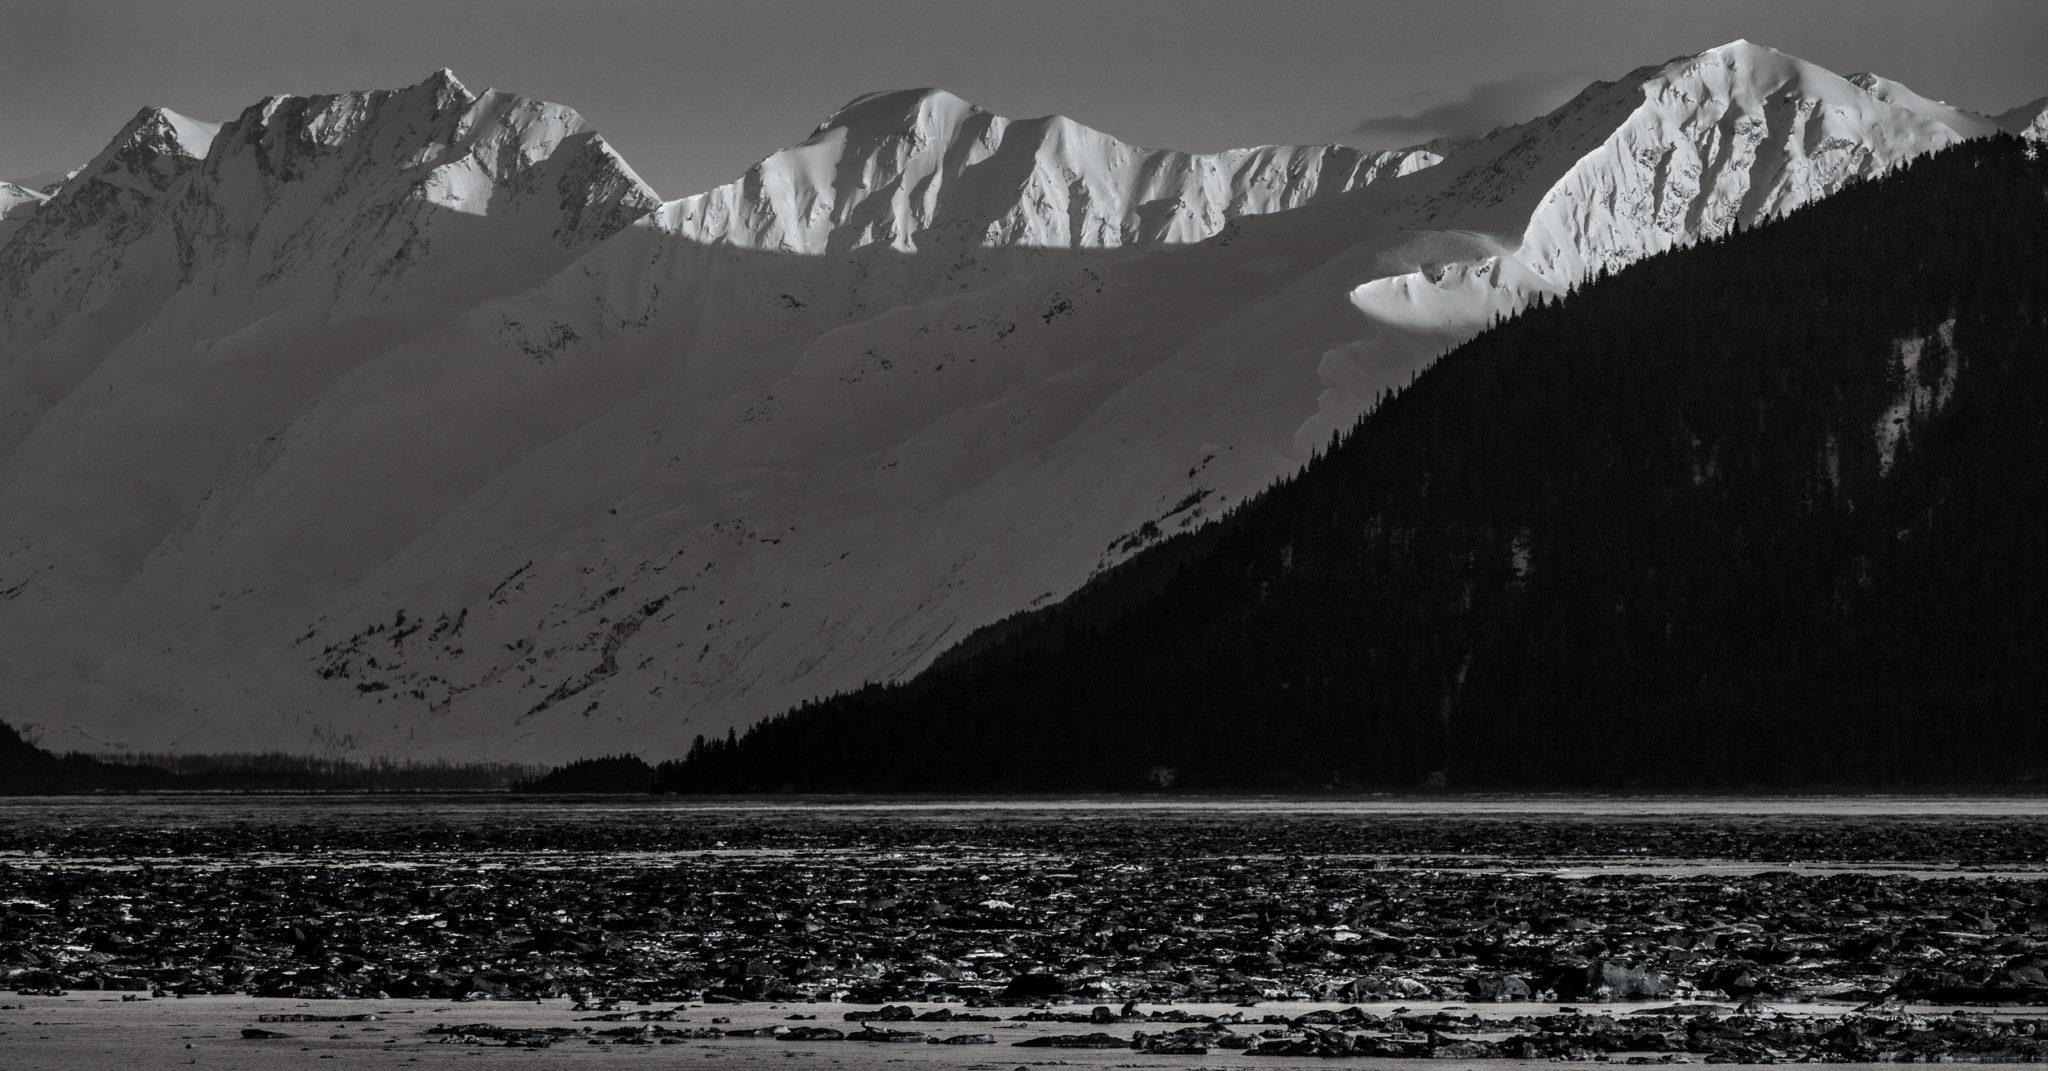 mountains and peaks around the Turnagain Arm - Alaska photography   Alaskafoto